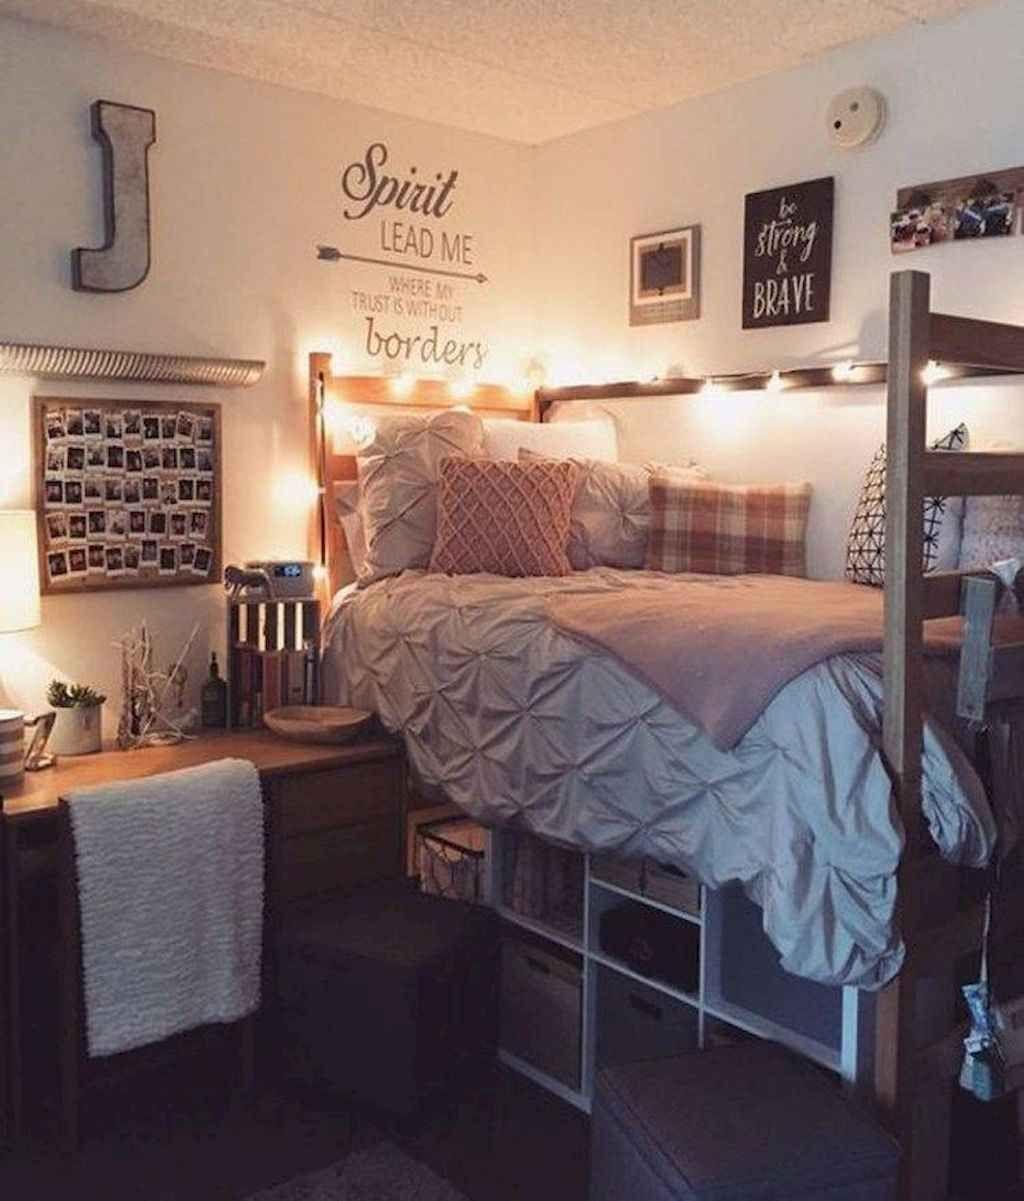 65 Clever Dorm Room Organizing Storage Ideas on A Budget #organizingdormrooms